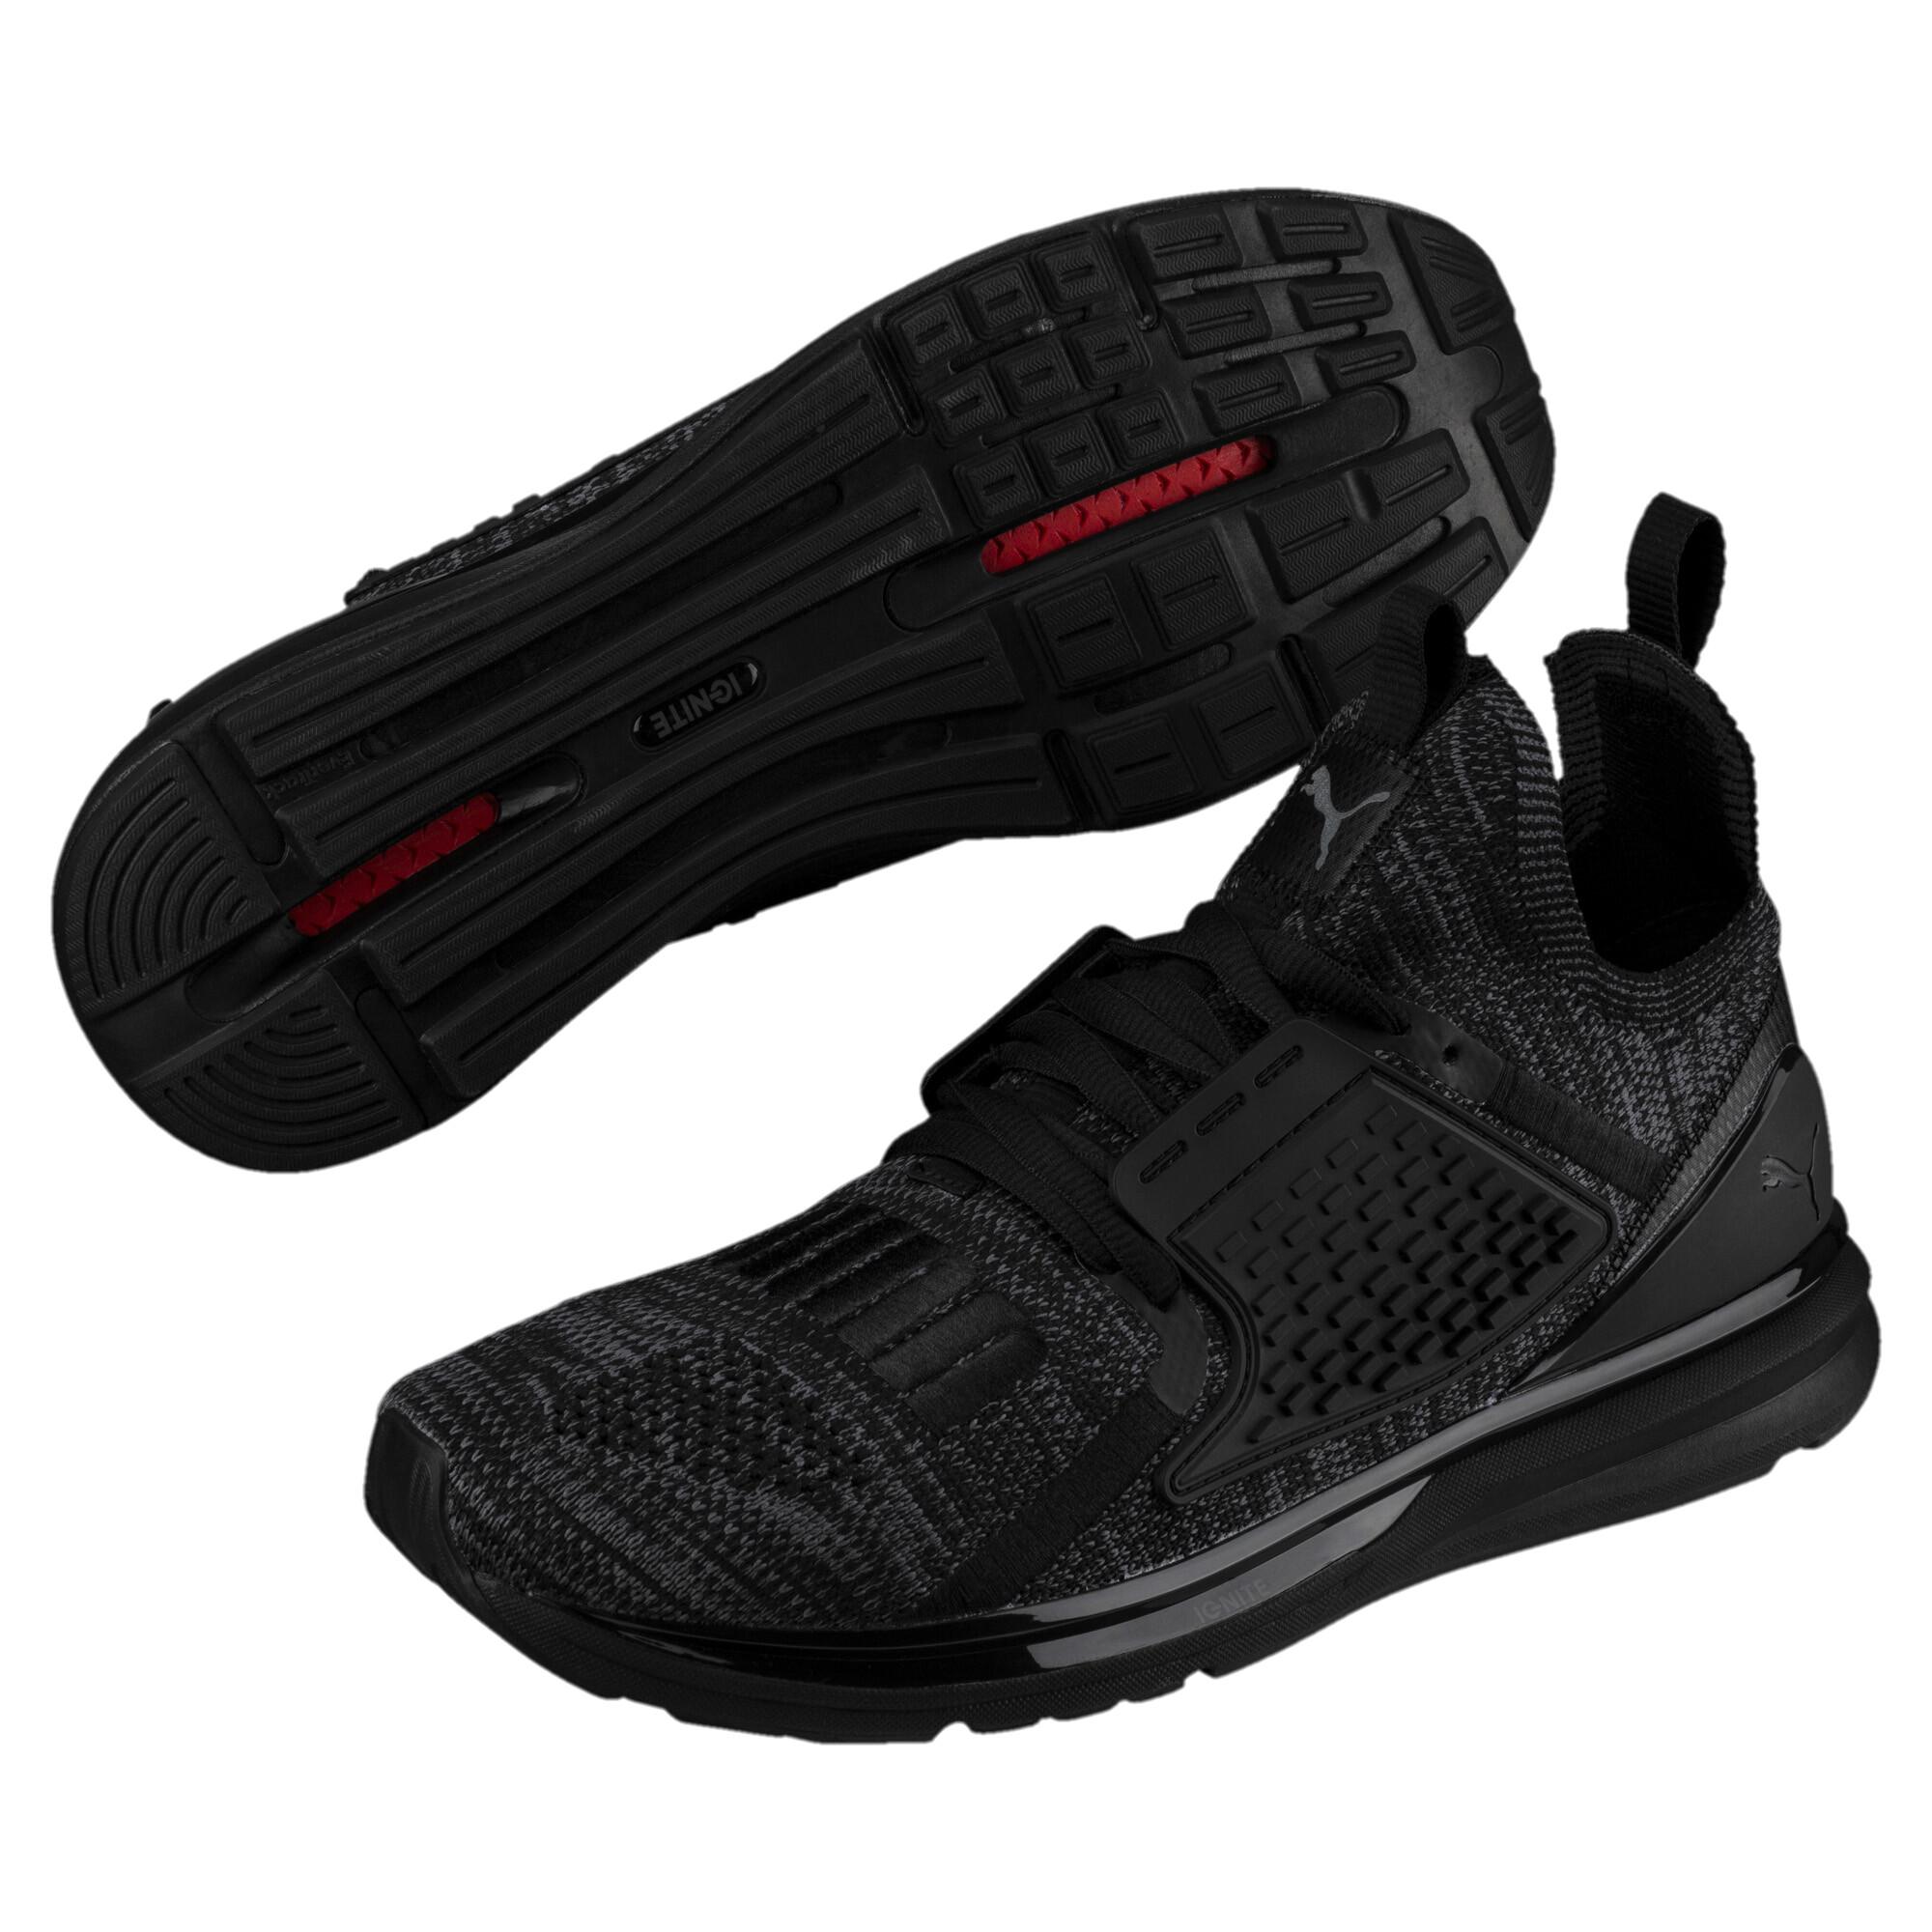 d0e06065e PUMA IGNITE Limitless 2 evoKNIT Sneakers Men Shoe Running | eBay